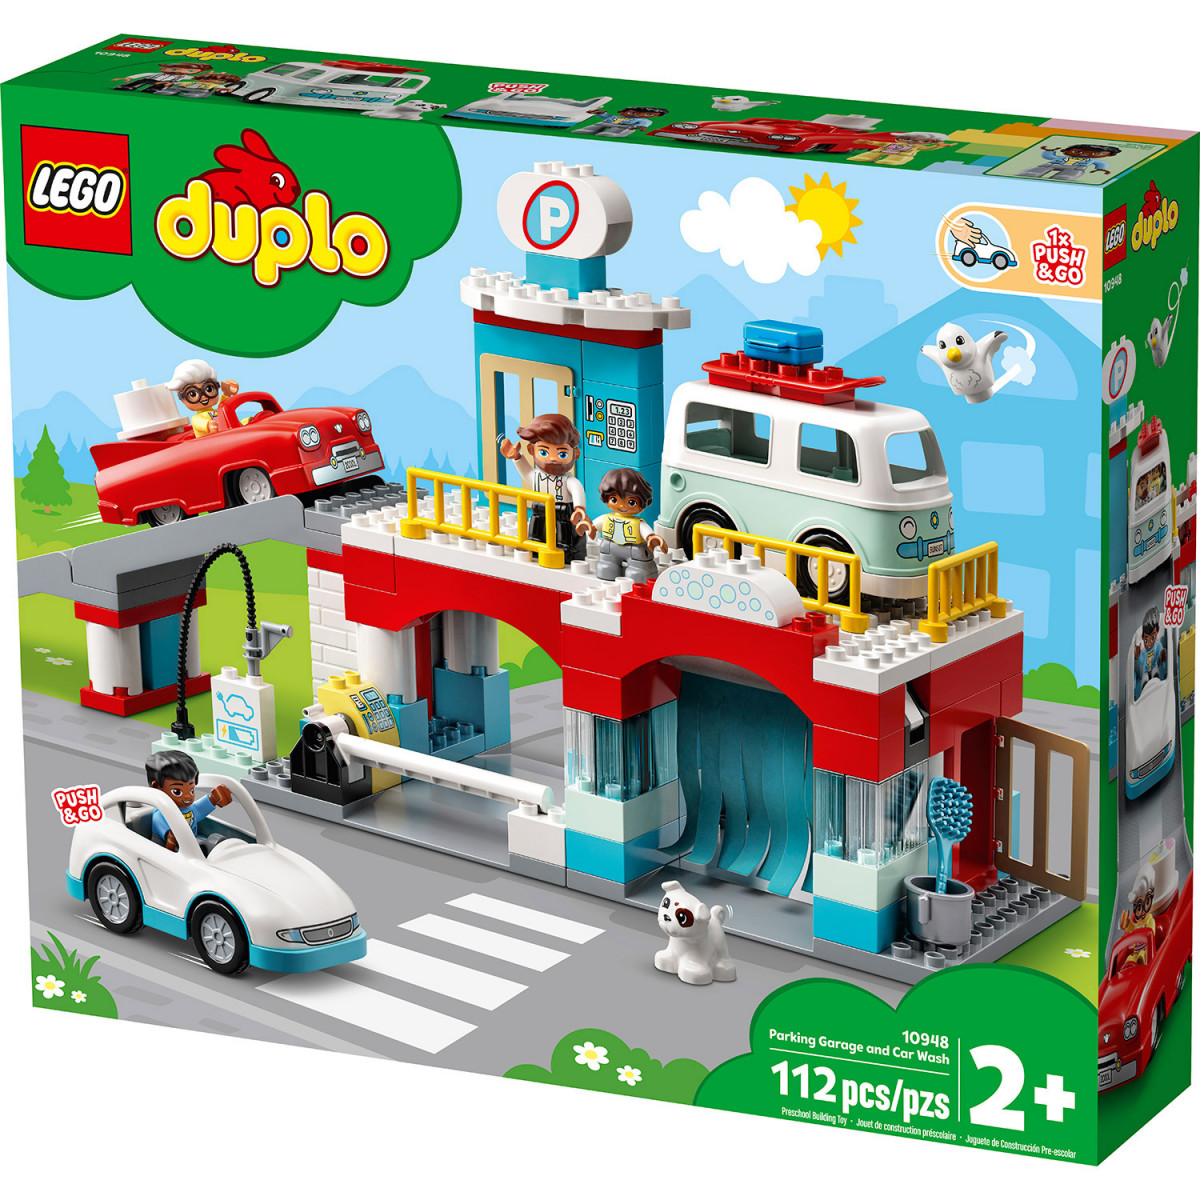 LEGO DUPLO TOWN PARKING GARAGE AND CAR WASH